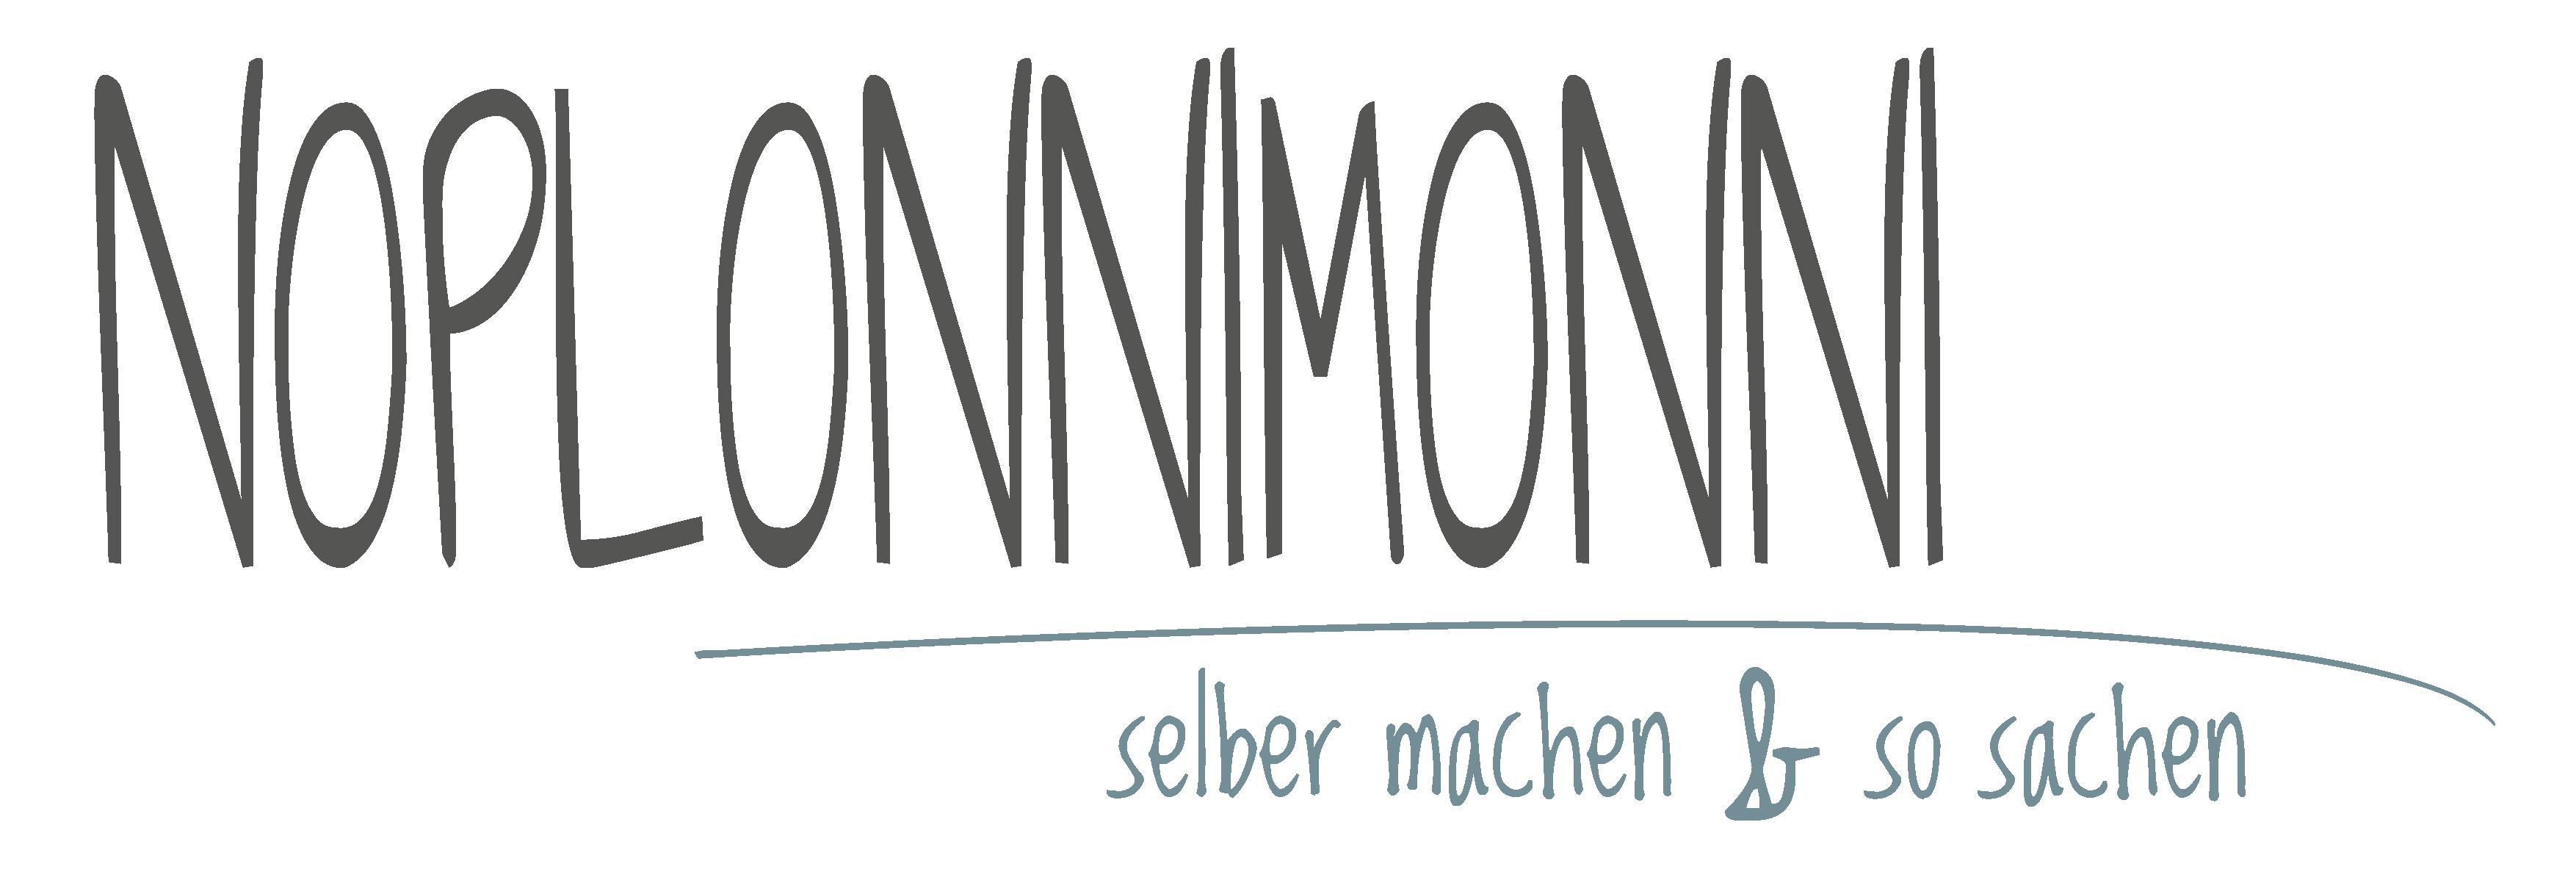 noplonnimonni